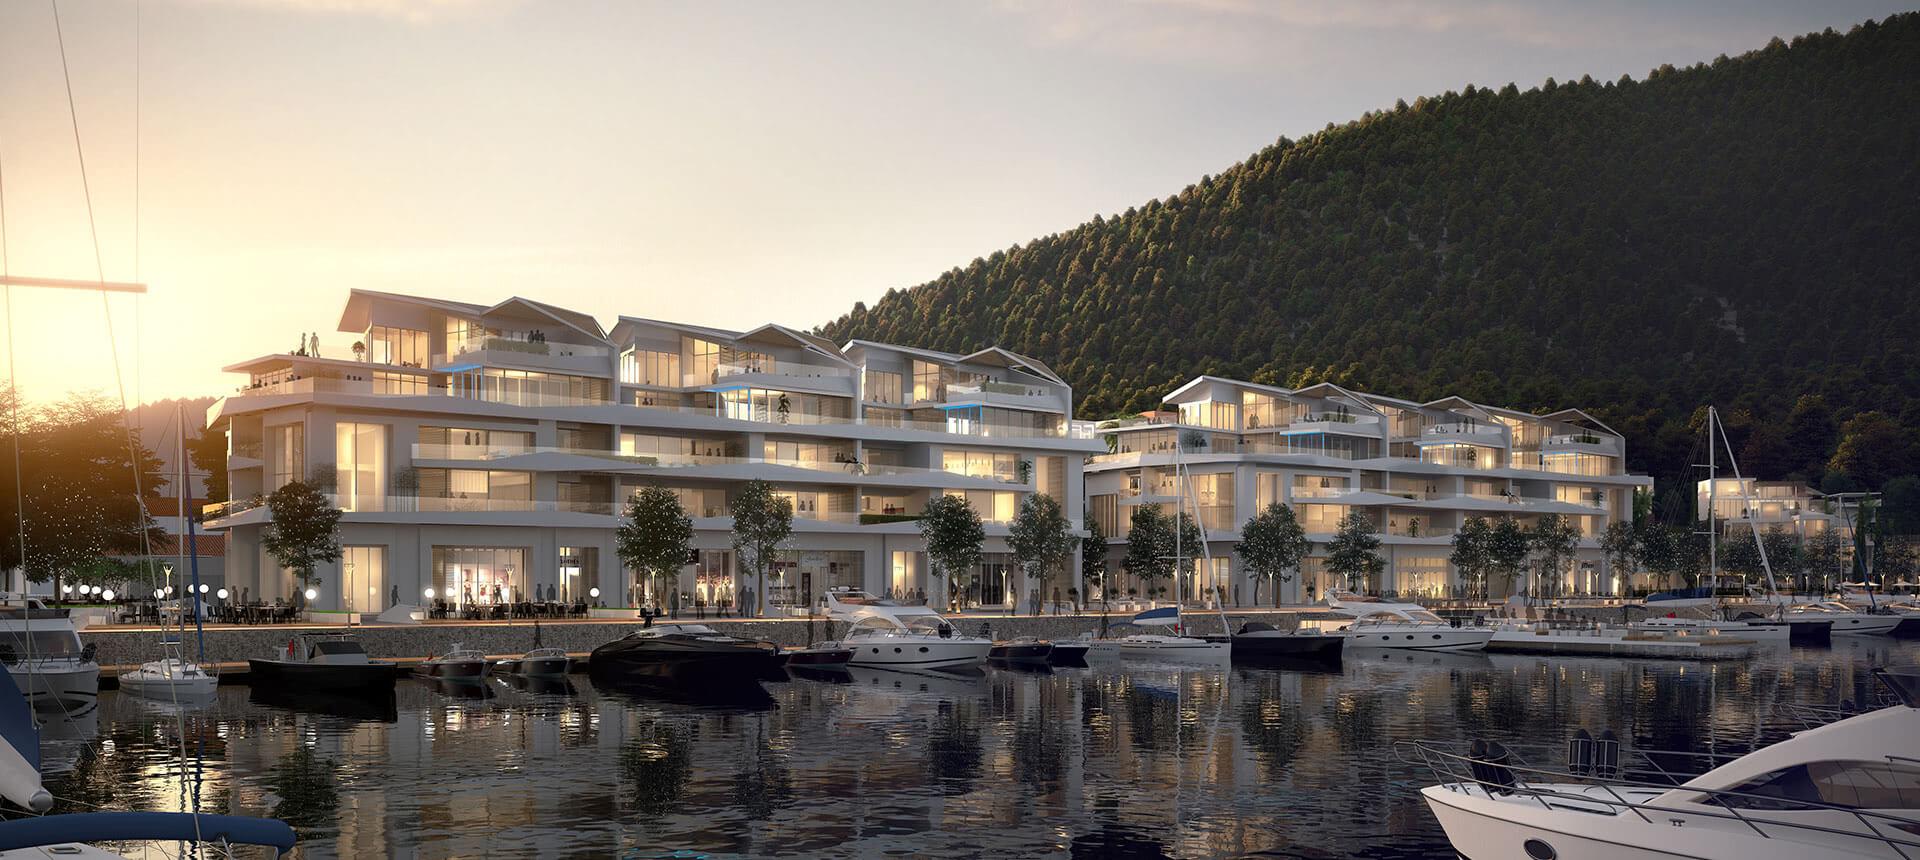 Portonovi marina apartments callisonrtkl for Arcadis bangalore